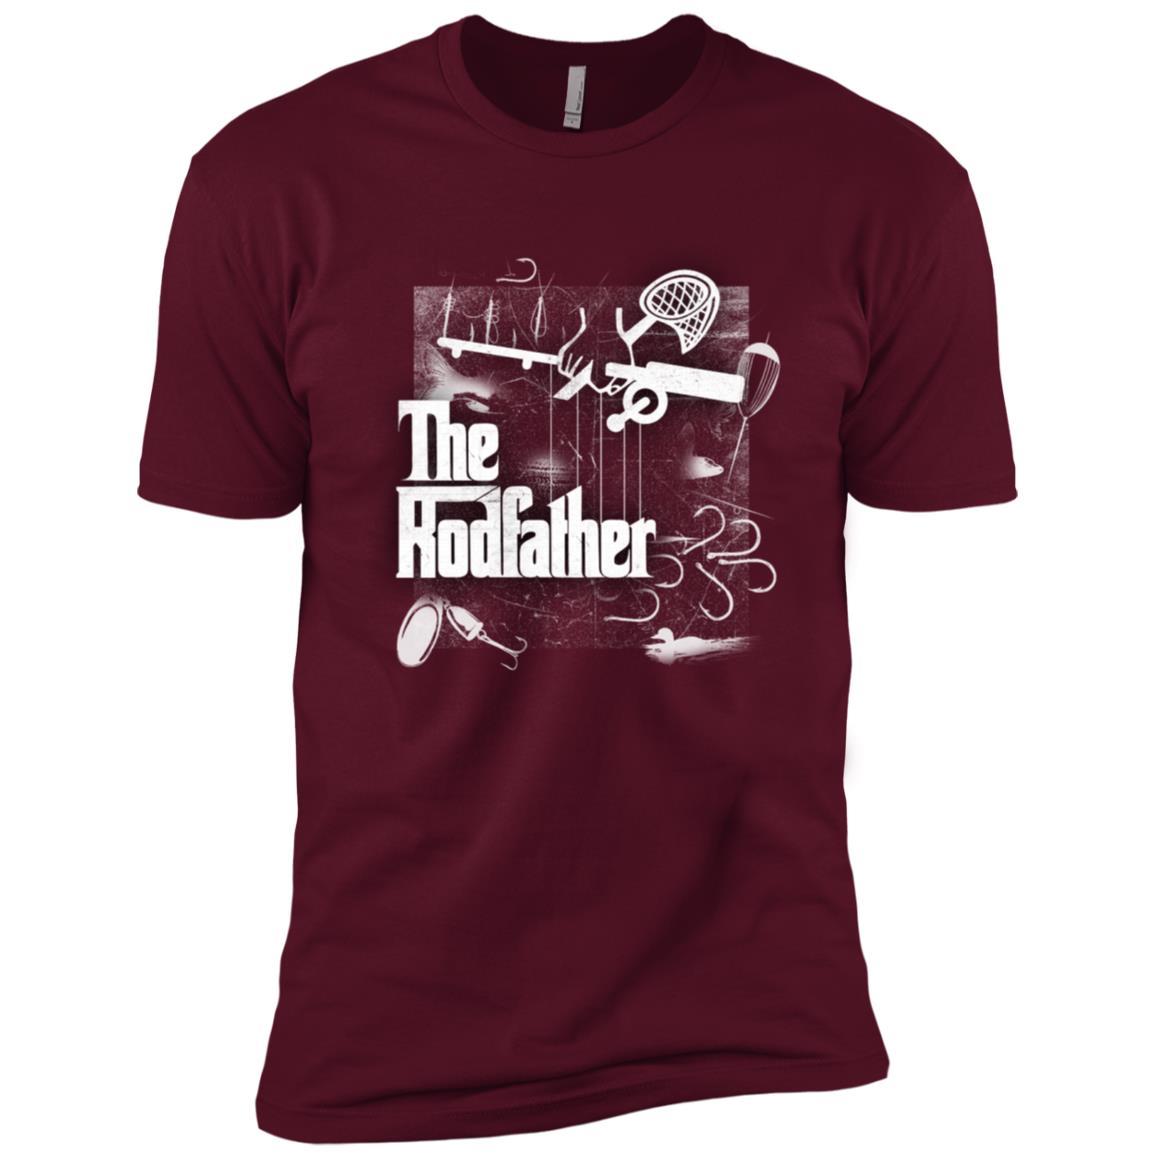 Fishing – The Rod Father – Funny Fisherman Gift Men Short Sleeve T-Shirt